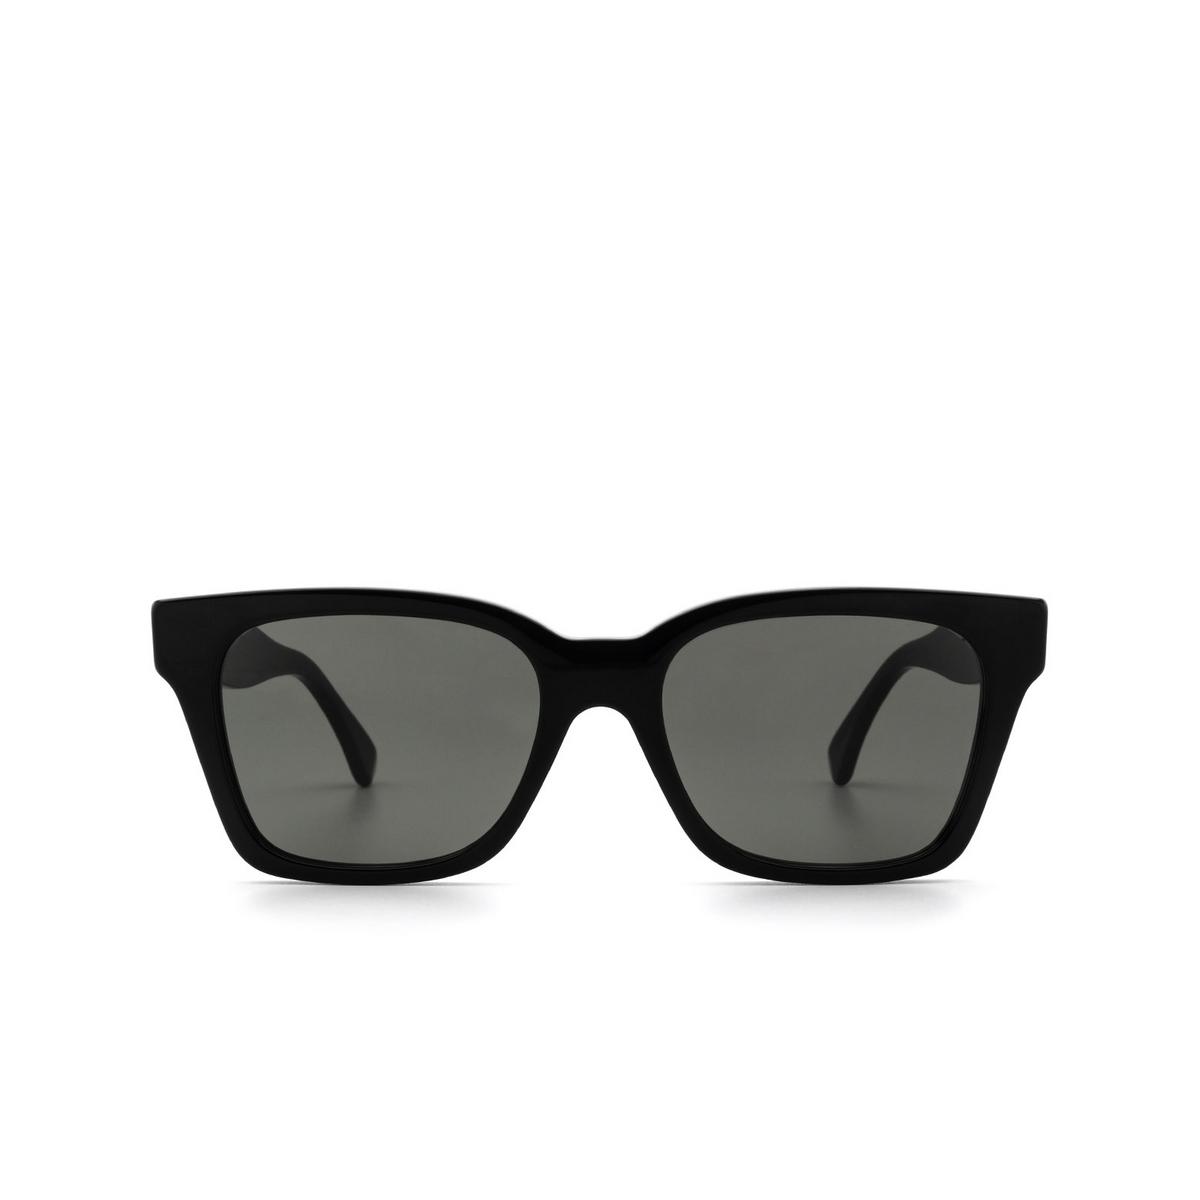 Retrosuperfuture® Square Sunglasses: America color Black C2N - front view.